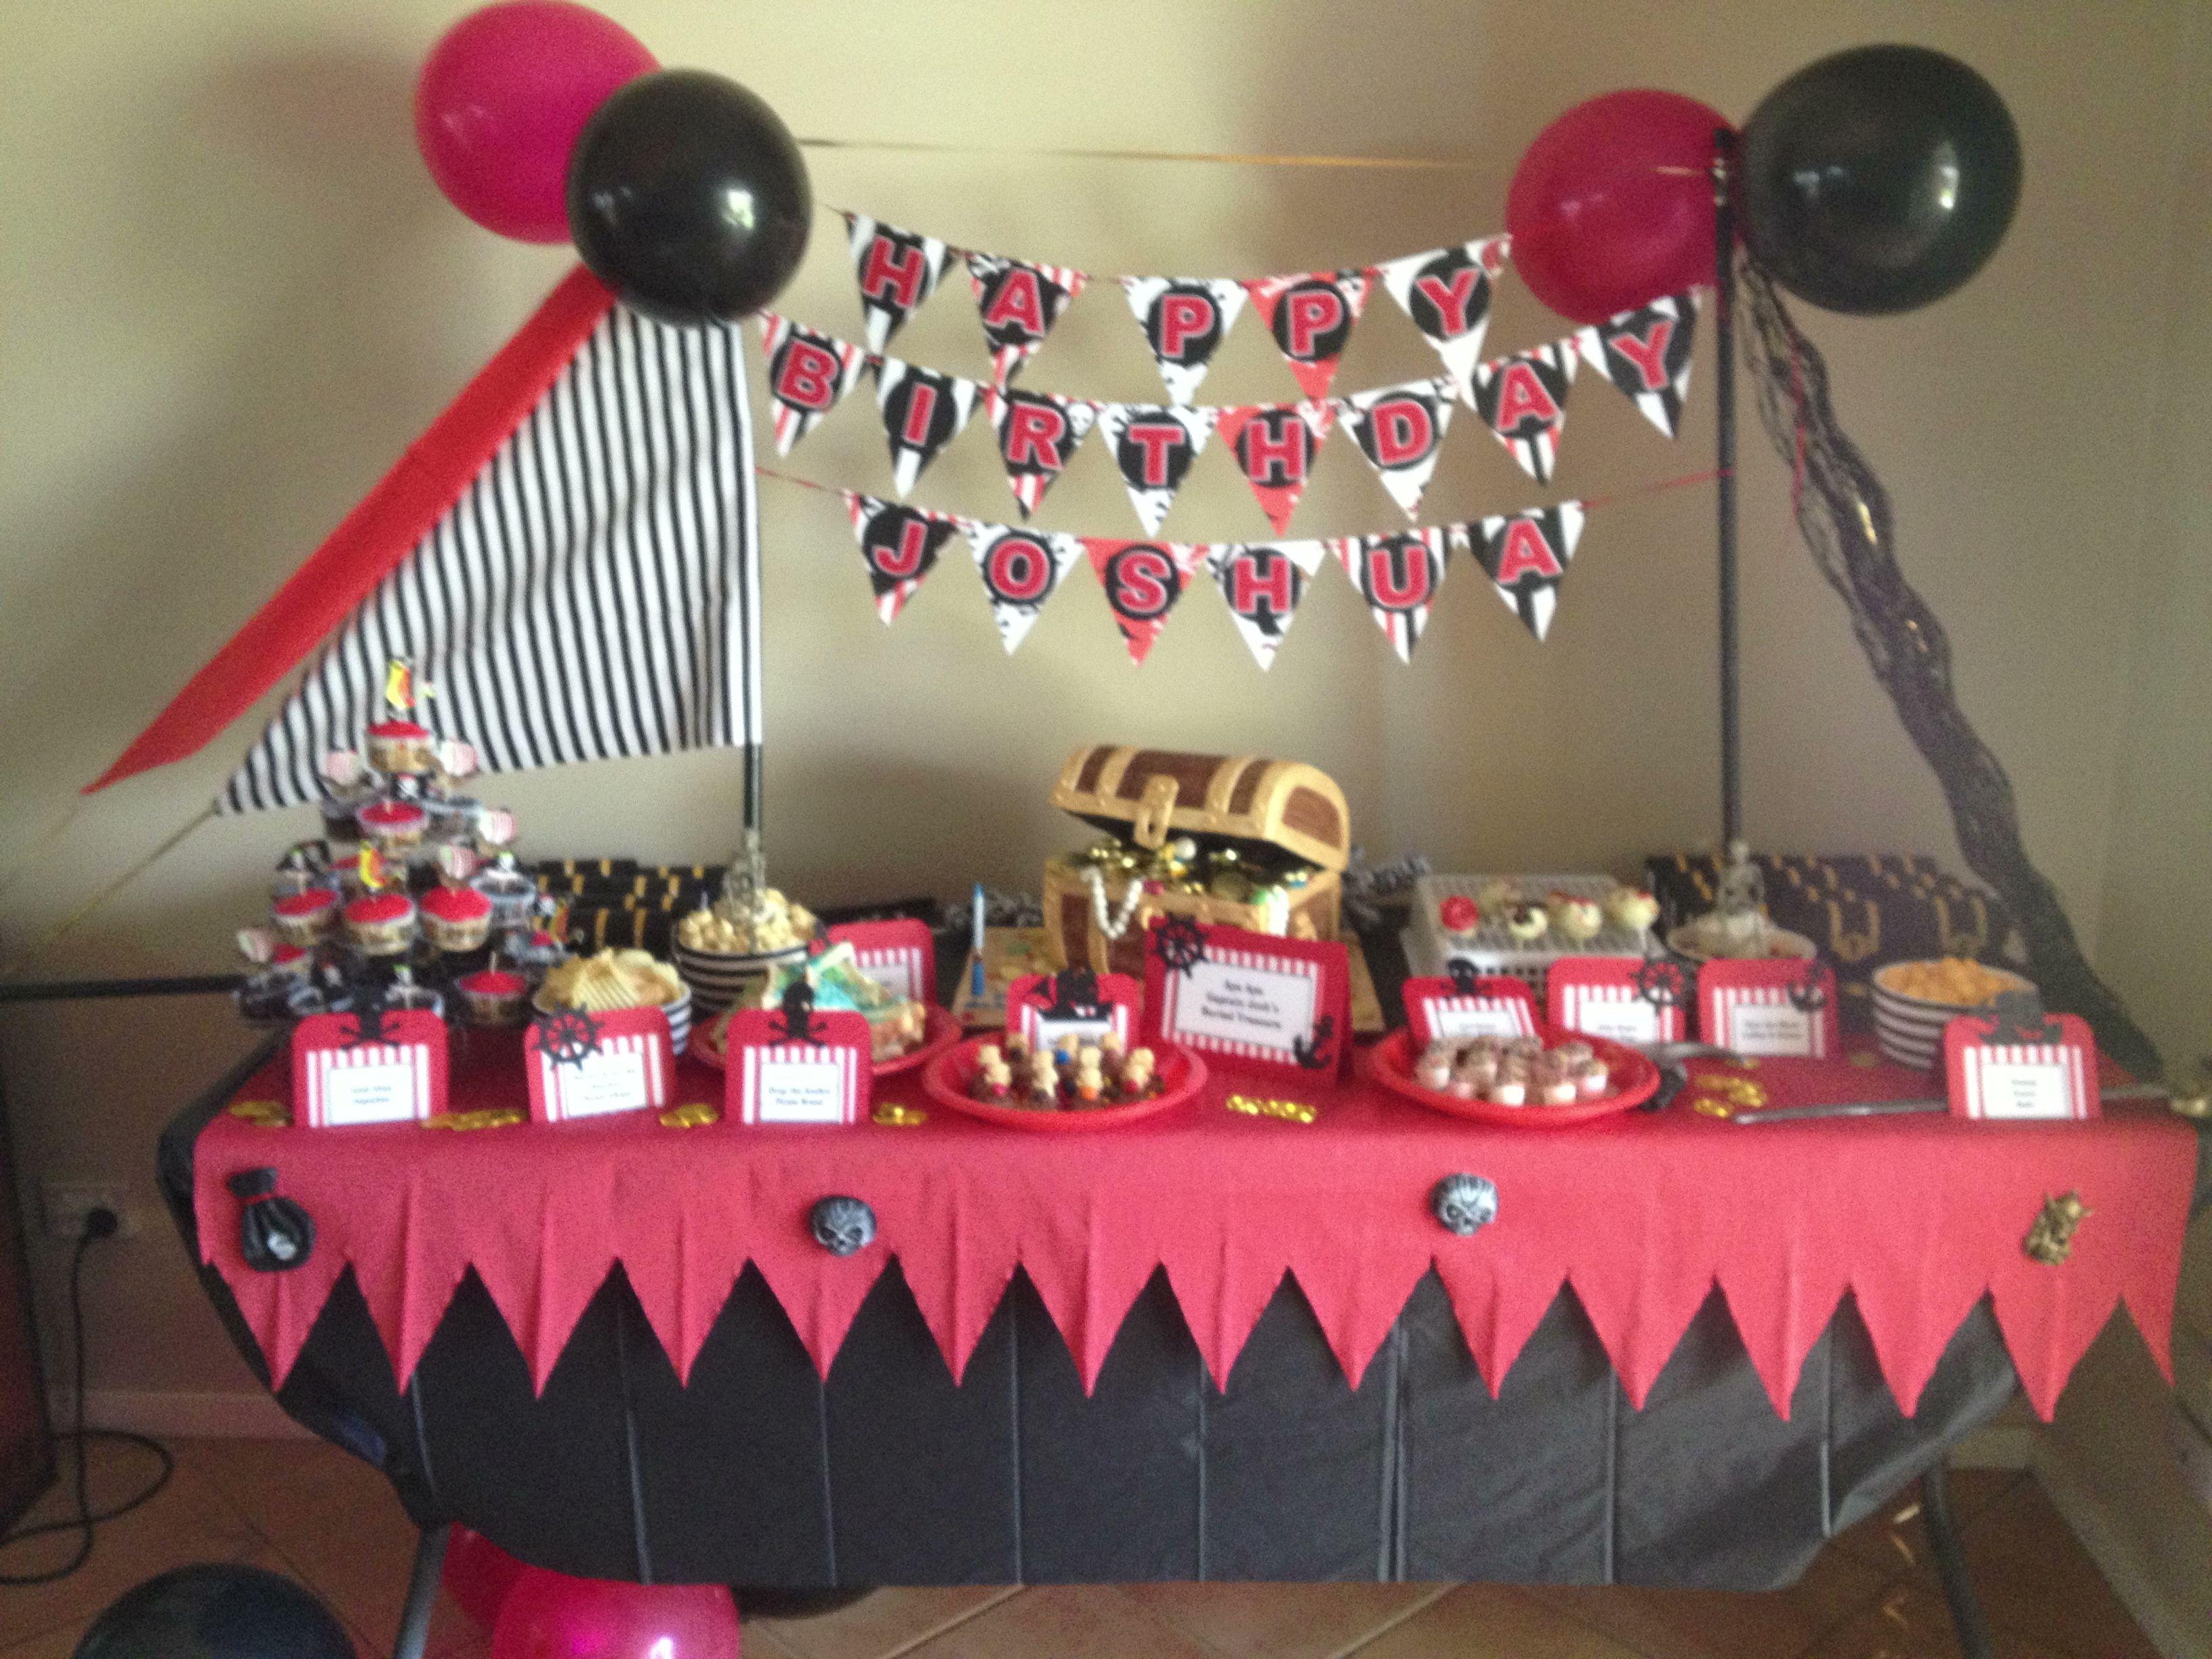 Joshua's Pirate Birthday dessert table